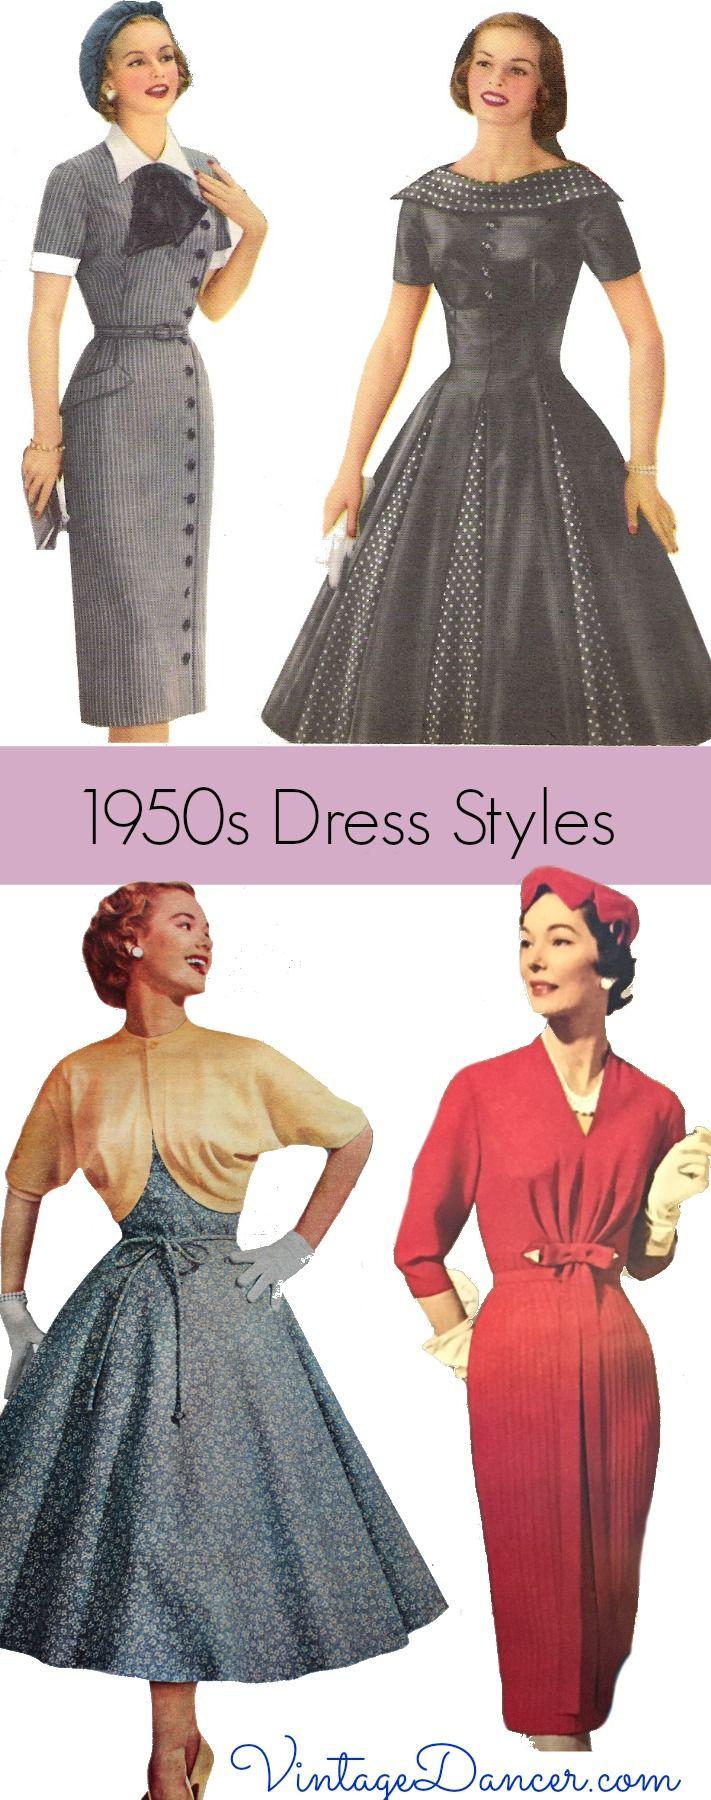 Vintage 50s Dresses Best 1950s Dress Styles 1950s Fashion Dresses Vintage Dresses 50s Fifties Fashion